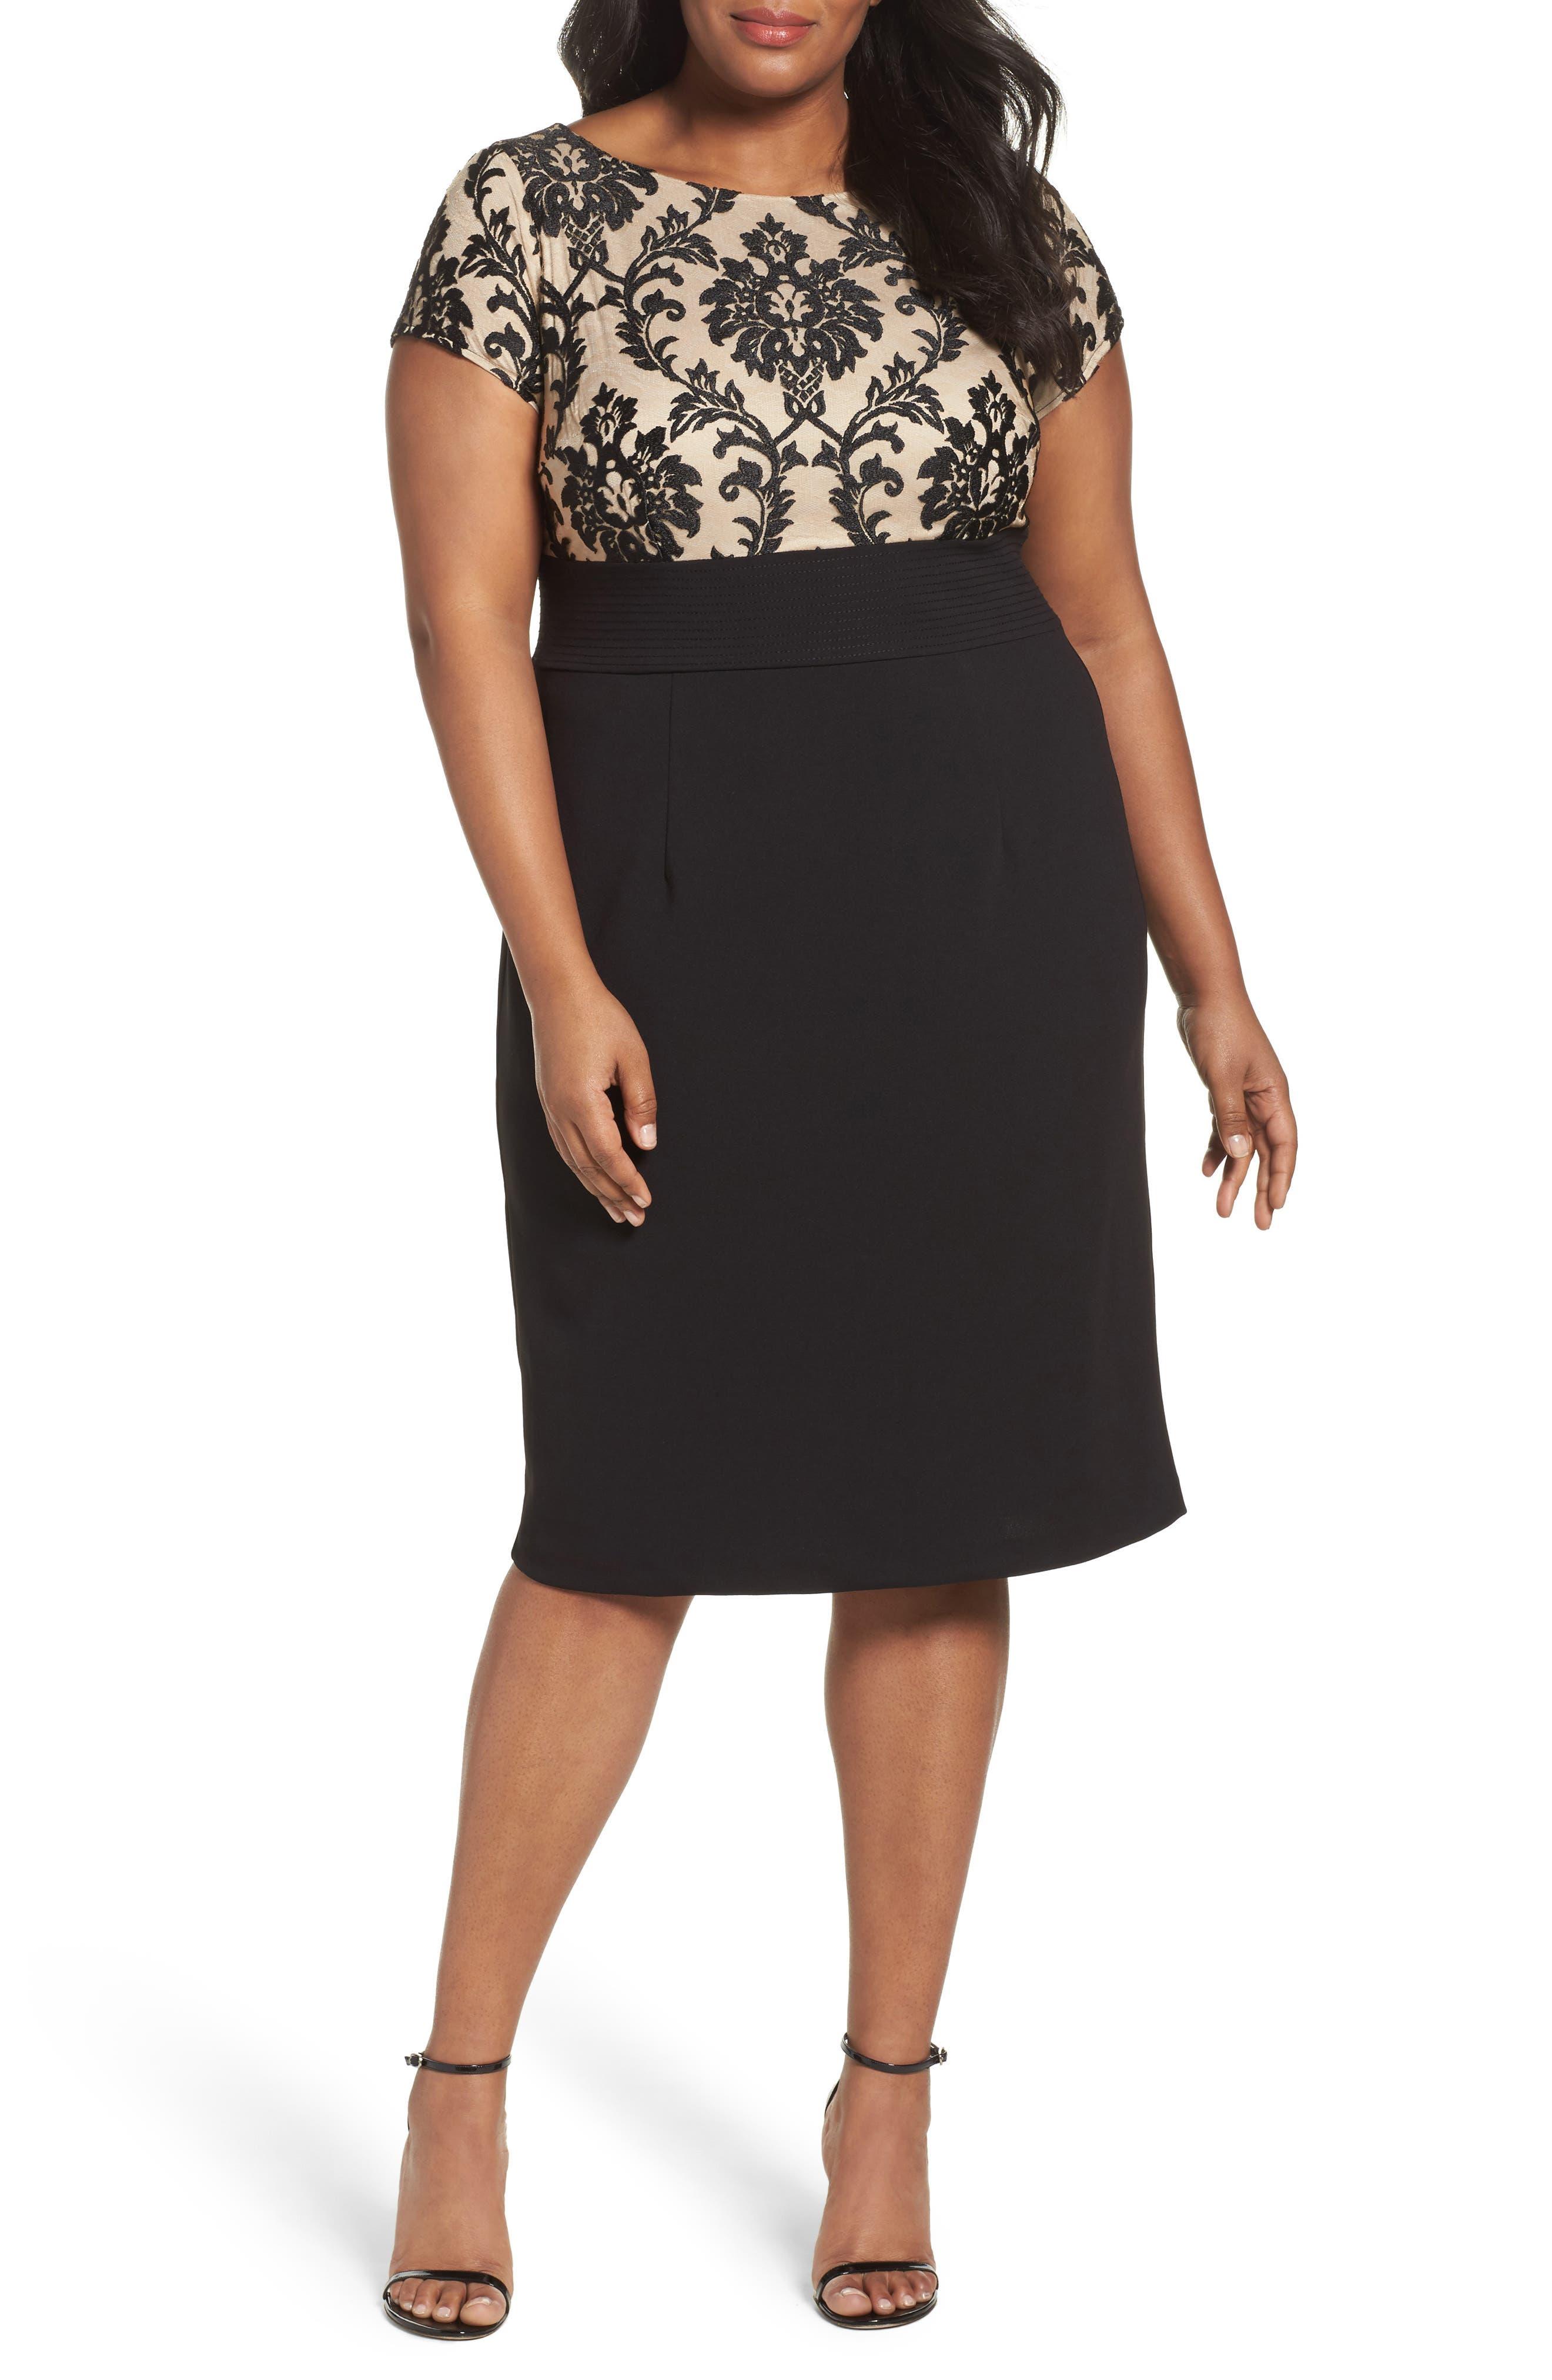 Adrianna Papell Illusion Lace Sheath Dress (Plus Size)